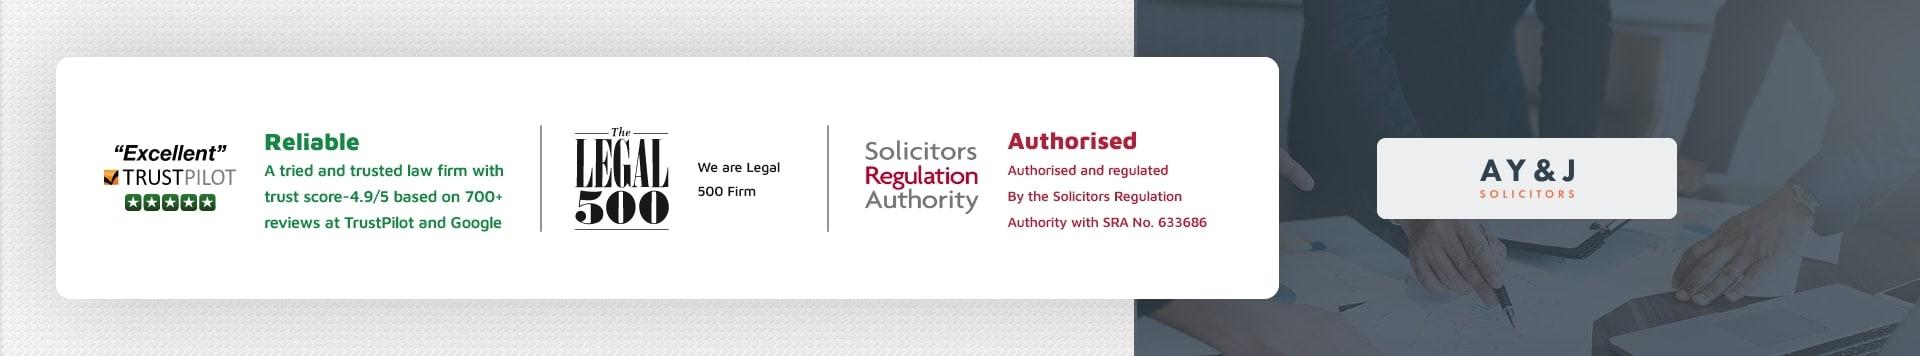 sponsor licence compliance